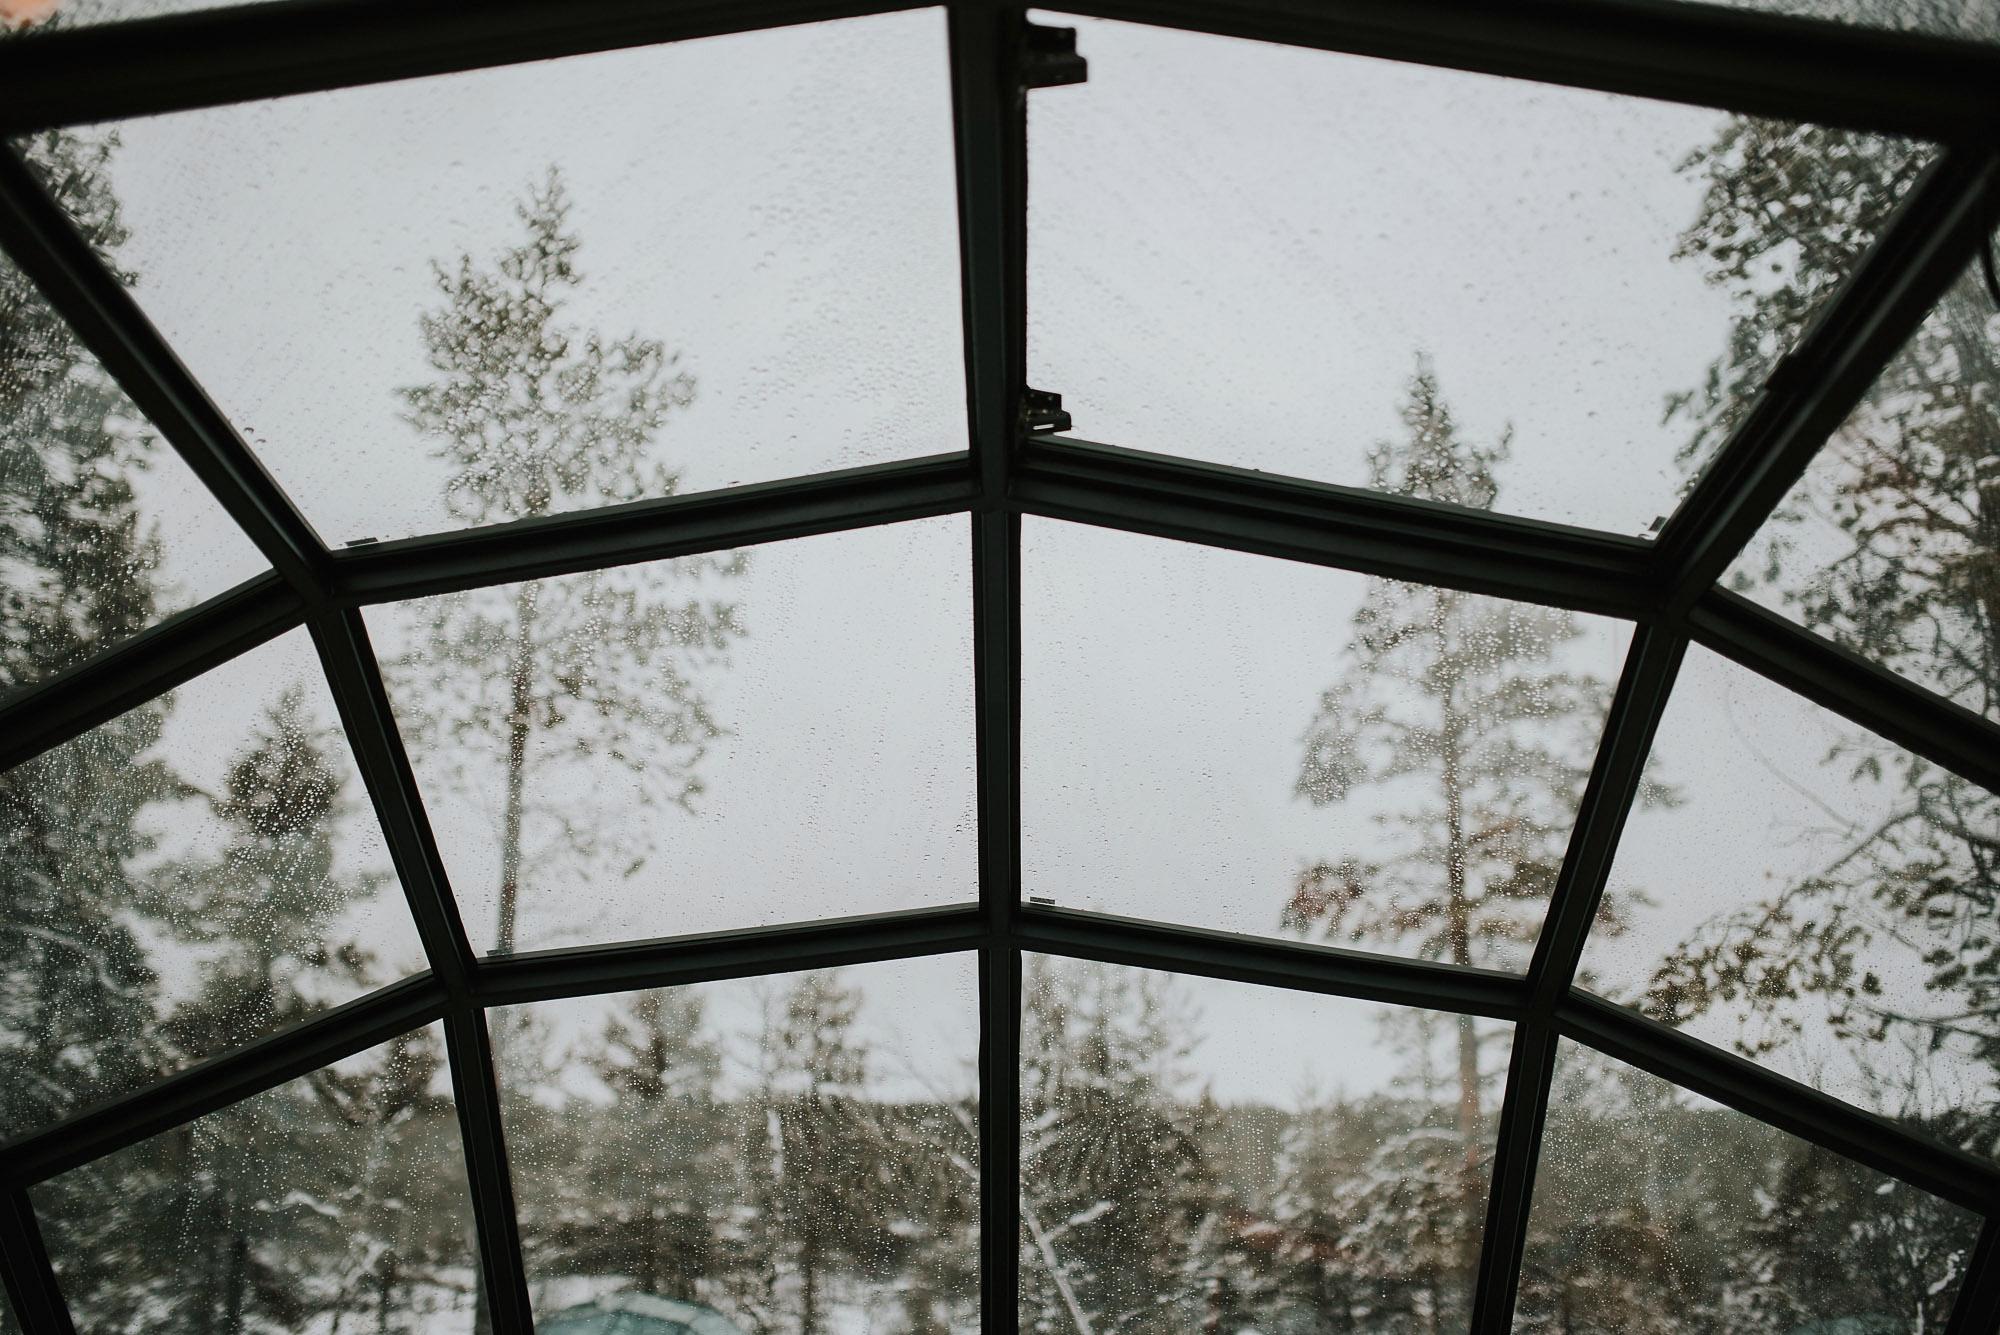 levi-ice-chapel-weddings-lapland-finland-photographer-jere-satamo-006-blog.jpg